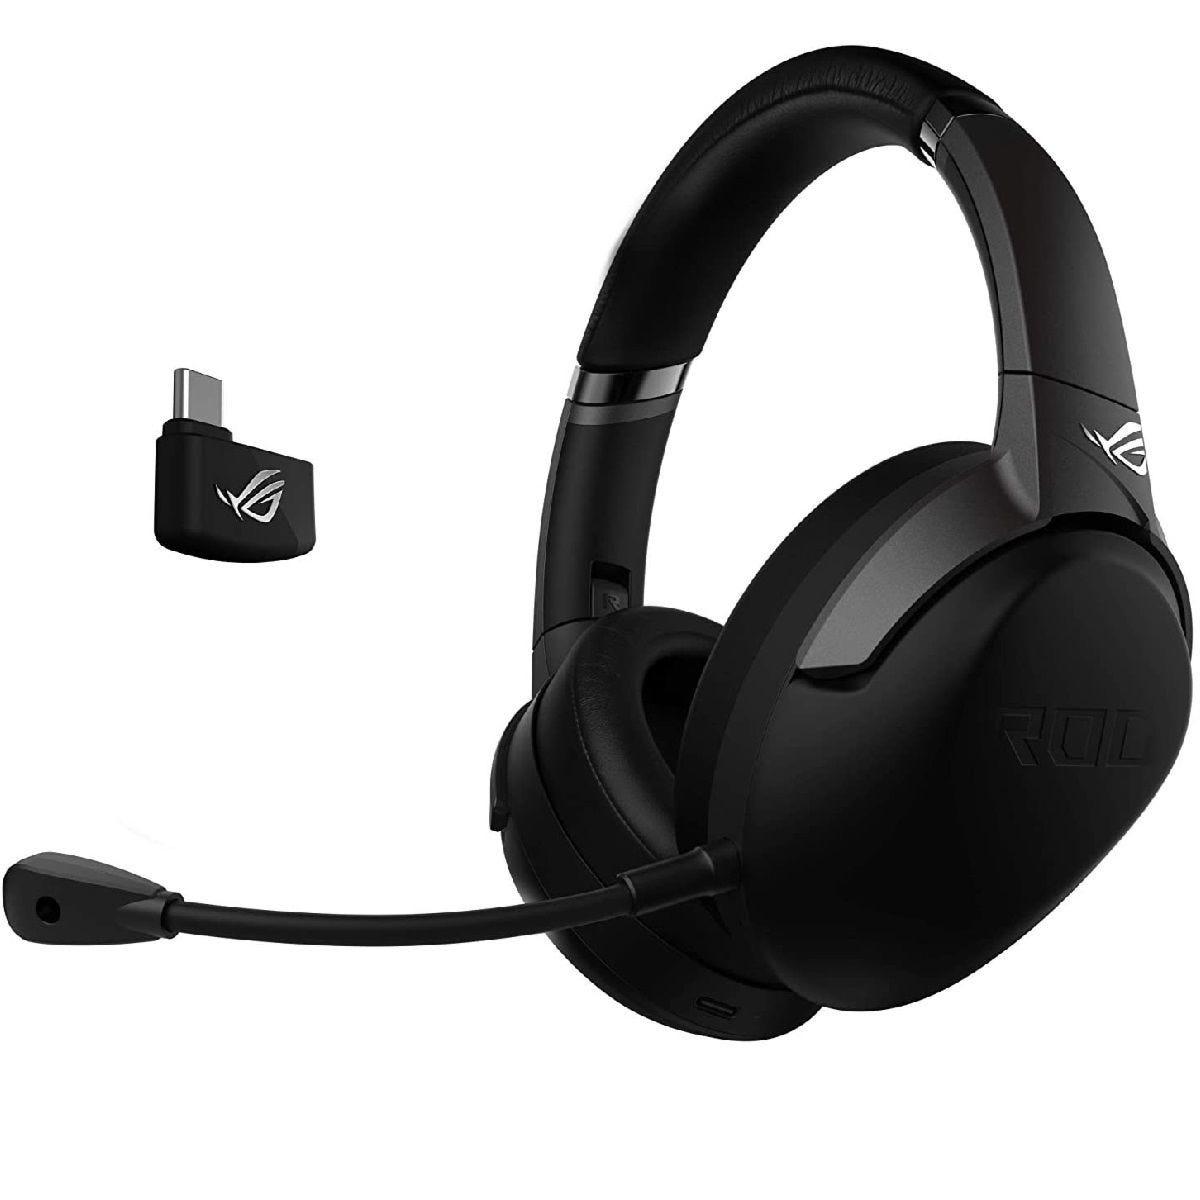 ASUS ROG Strix Go 2.4 USB-C Wireless Gaming Headset